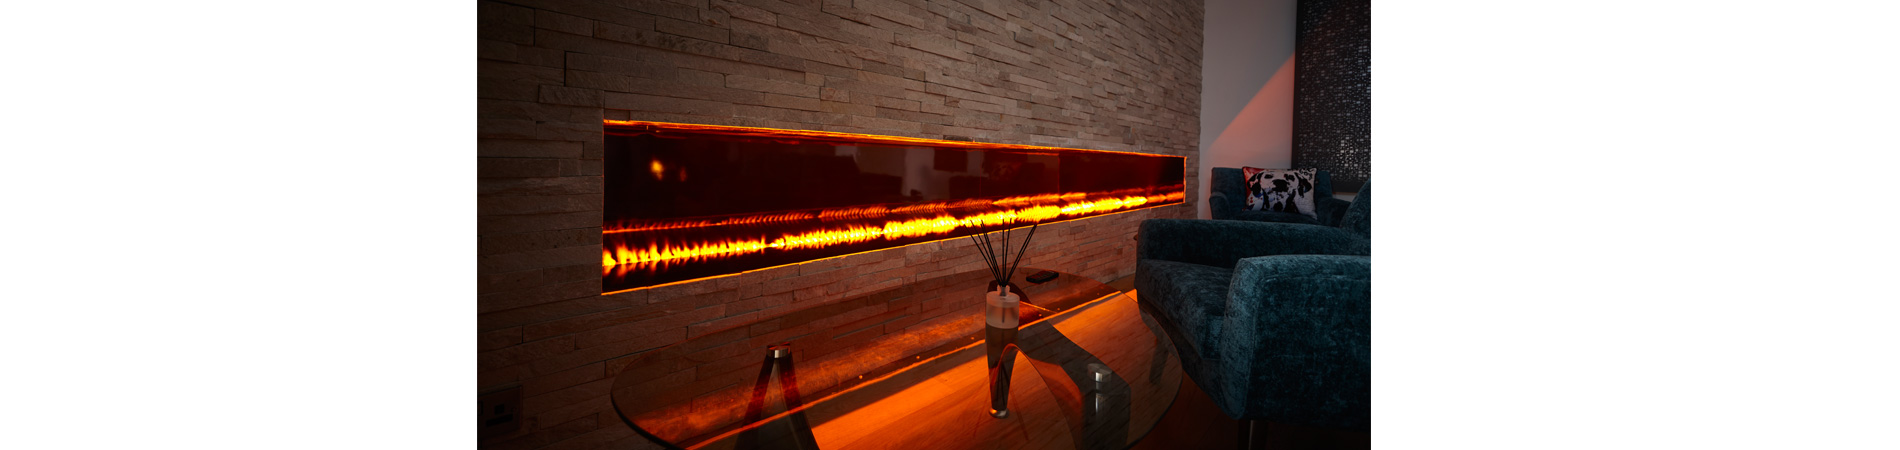 Opti-myst flame studio